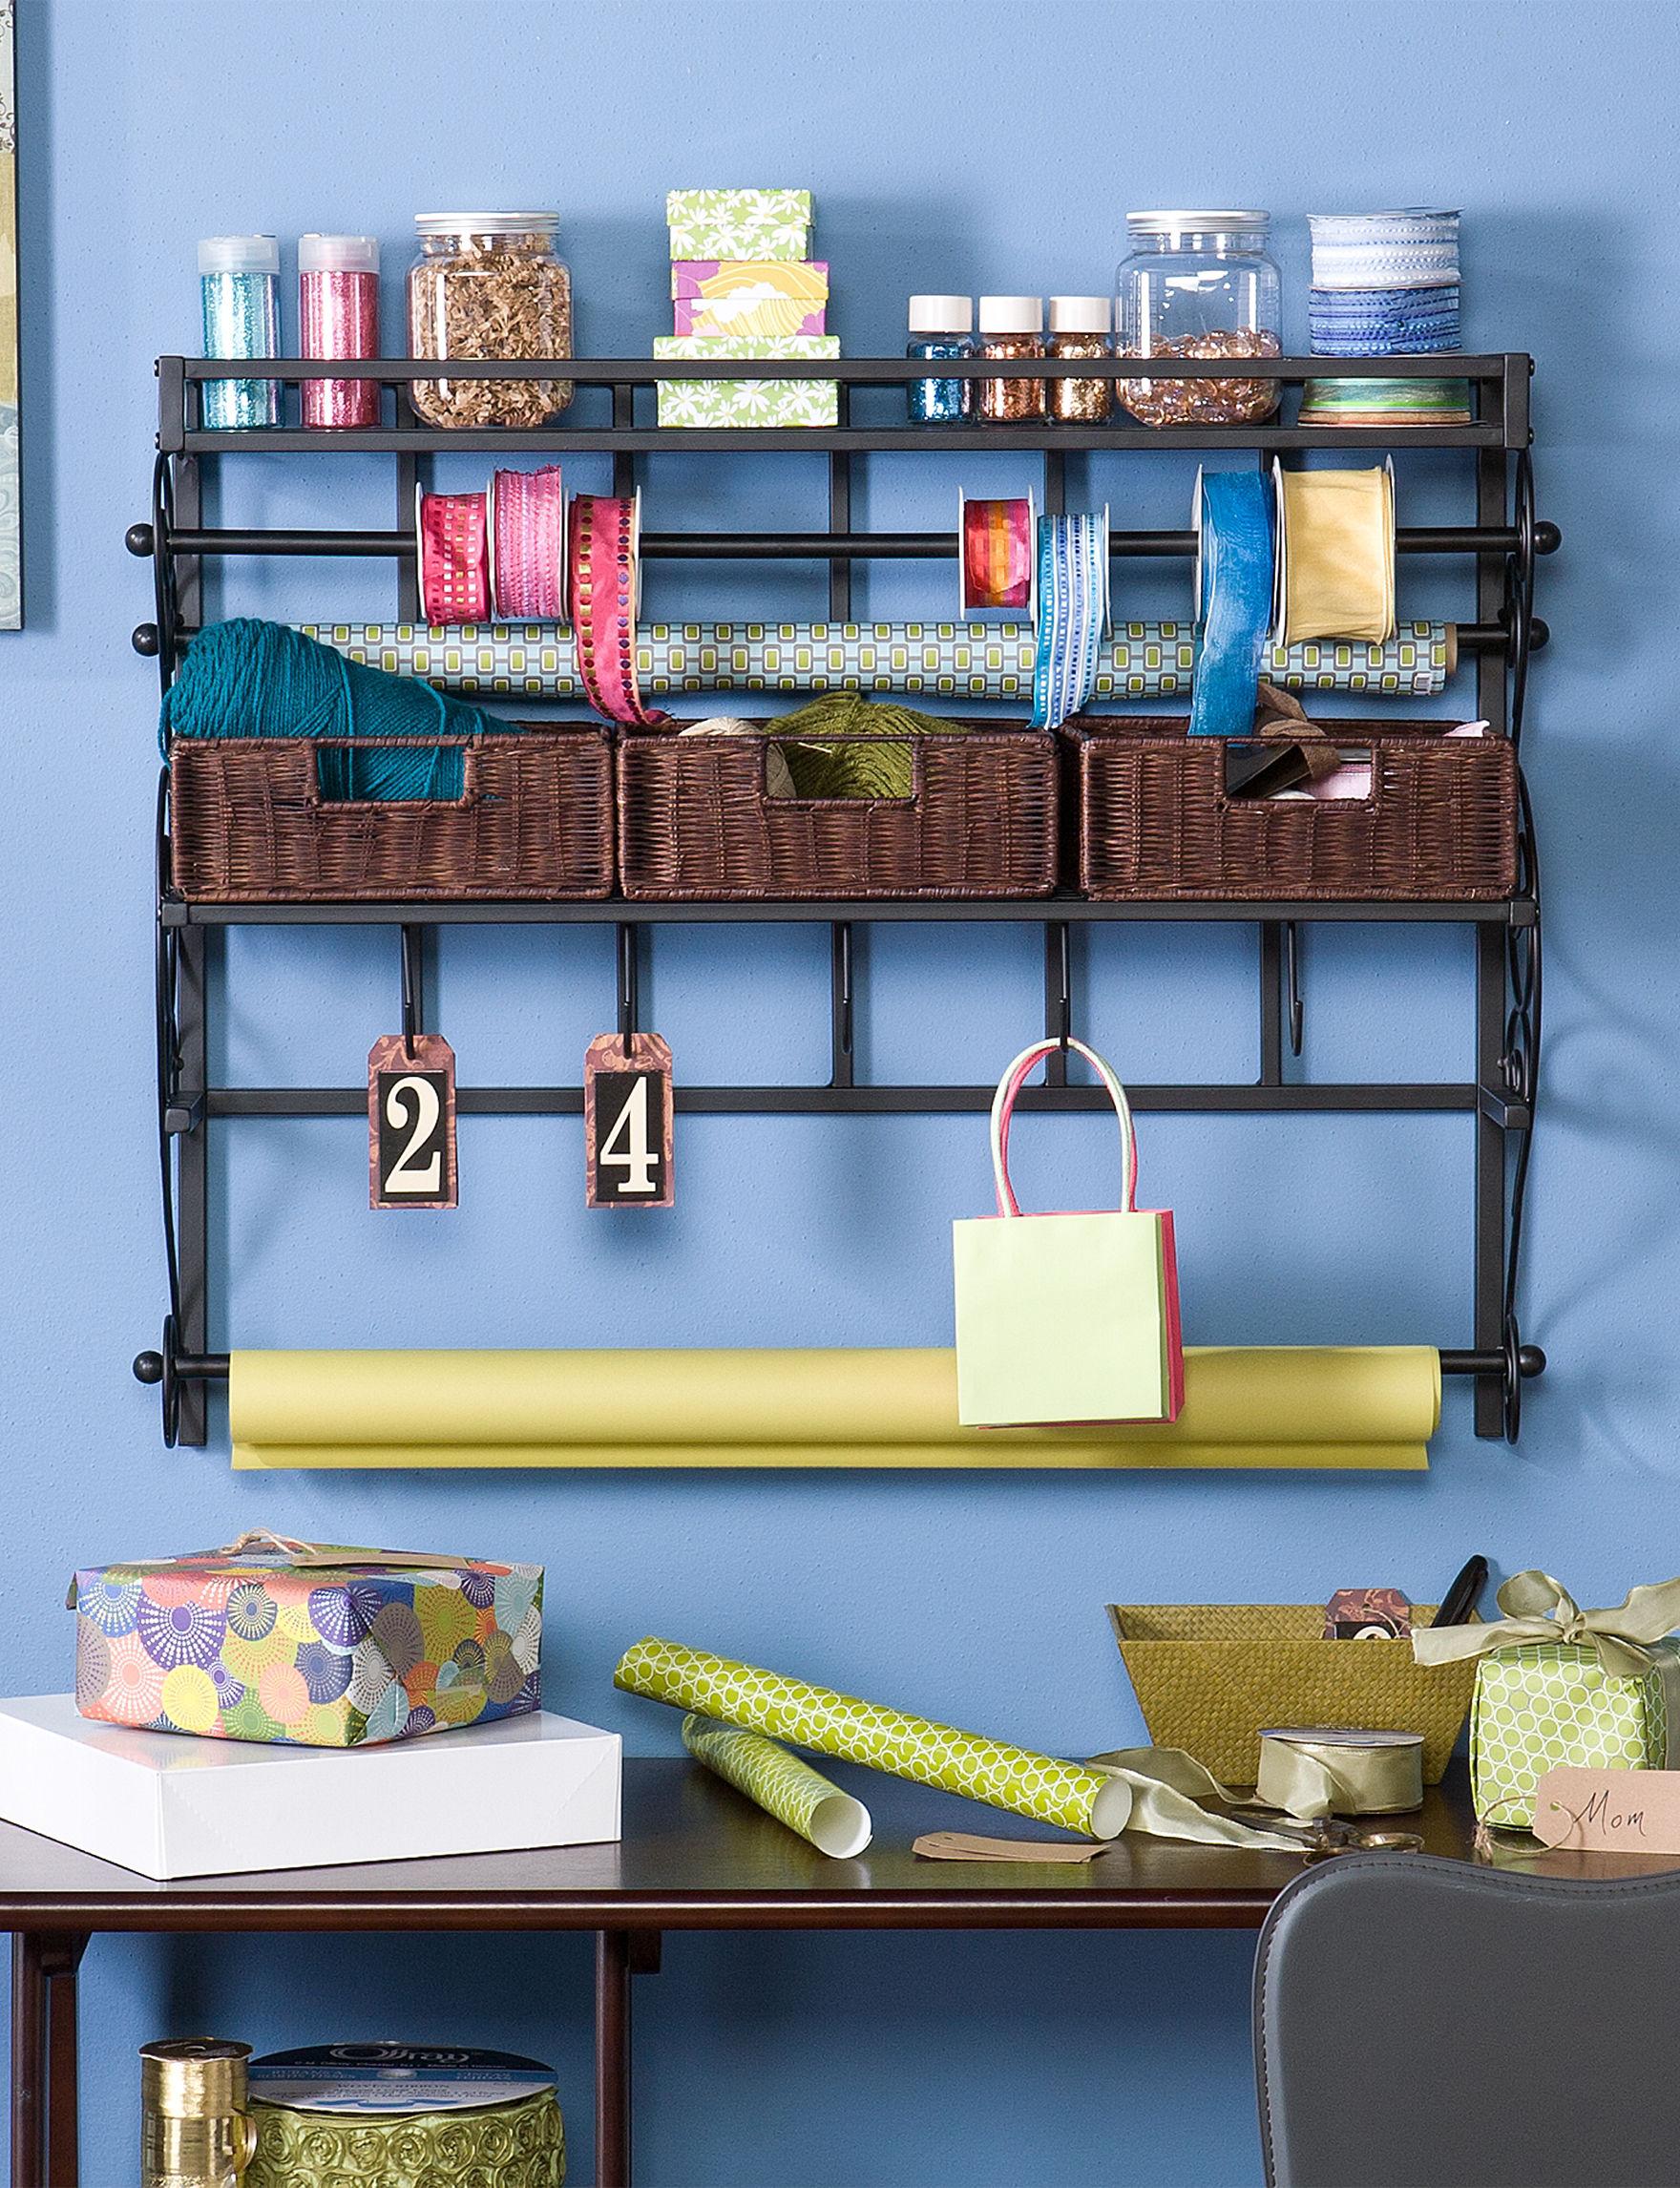 Southern Enterprises Expresso Accent Shelves & Wall Hooks Storage Shelves Storage & Organization Wall Decor